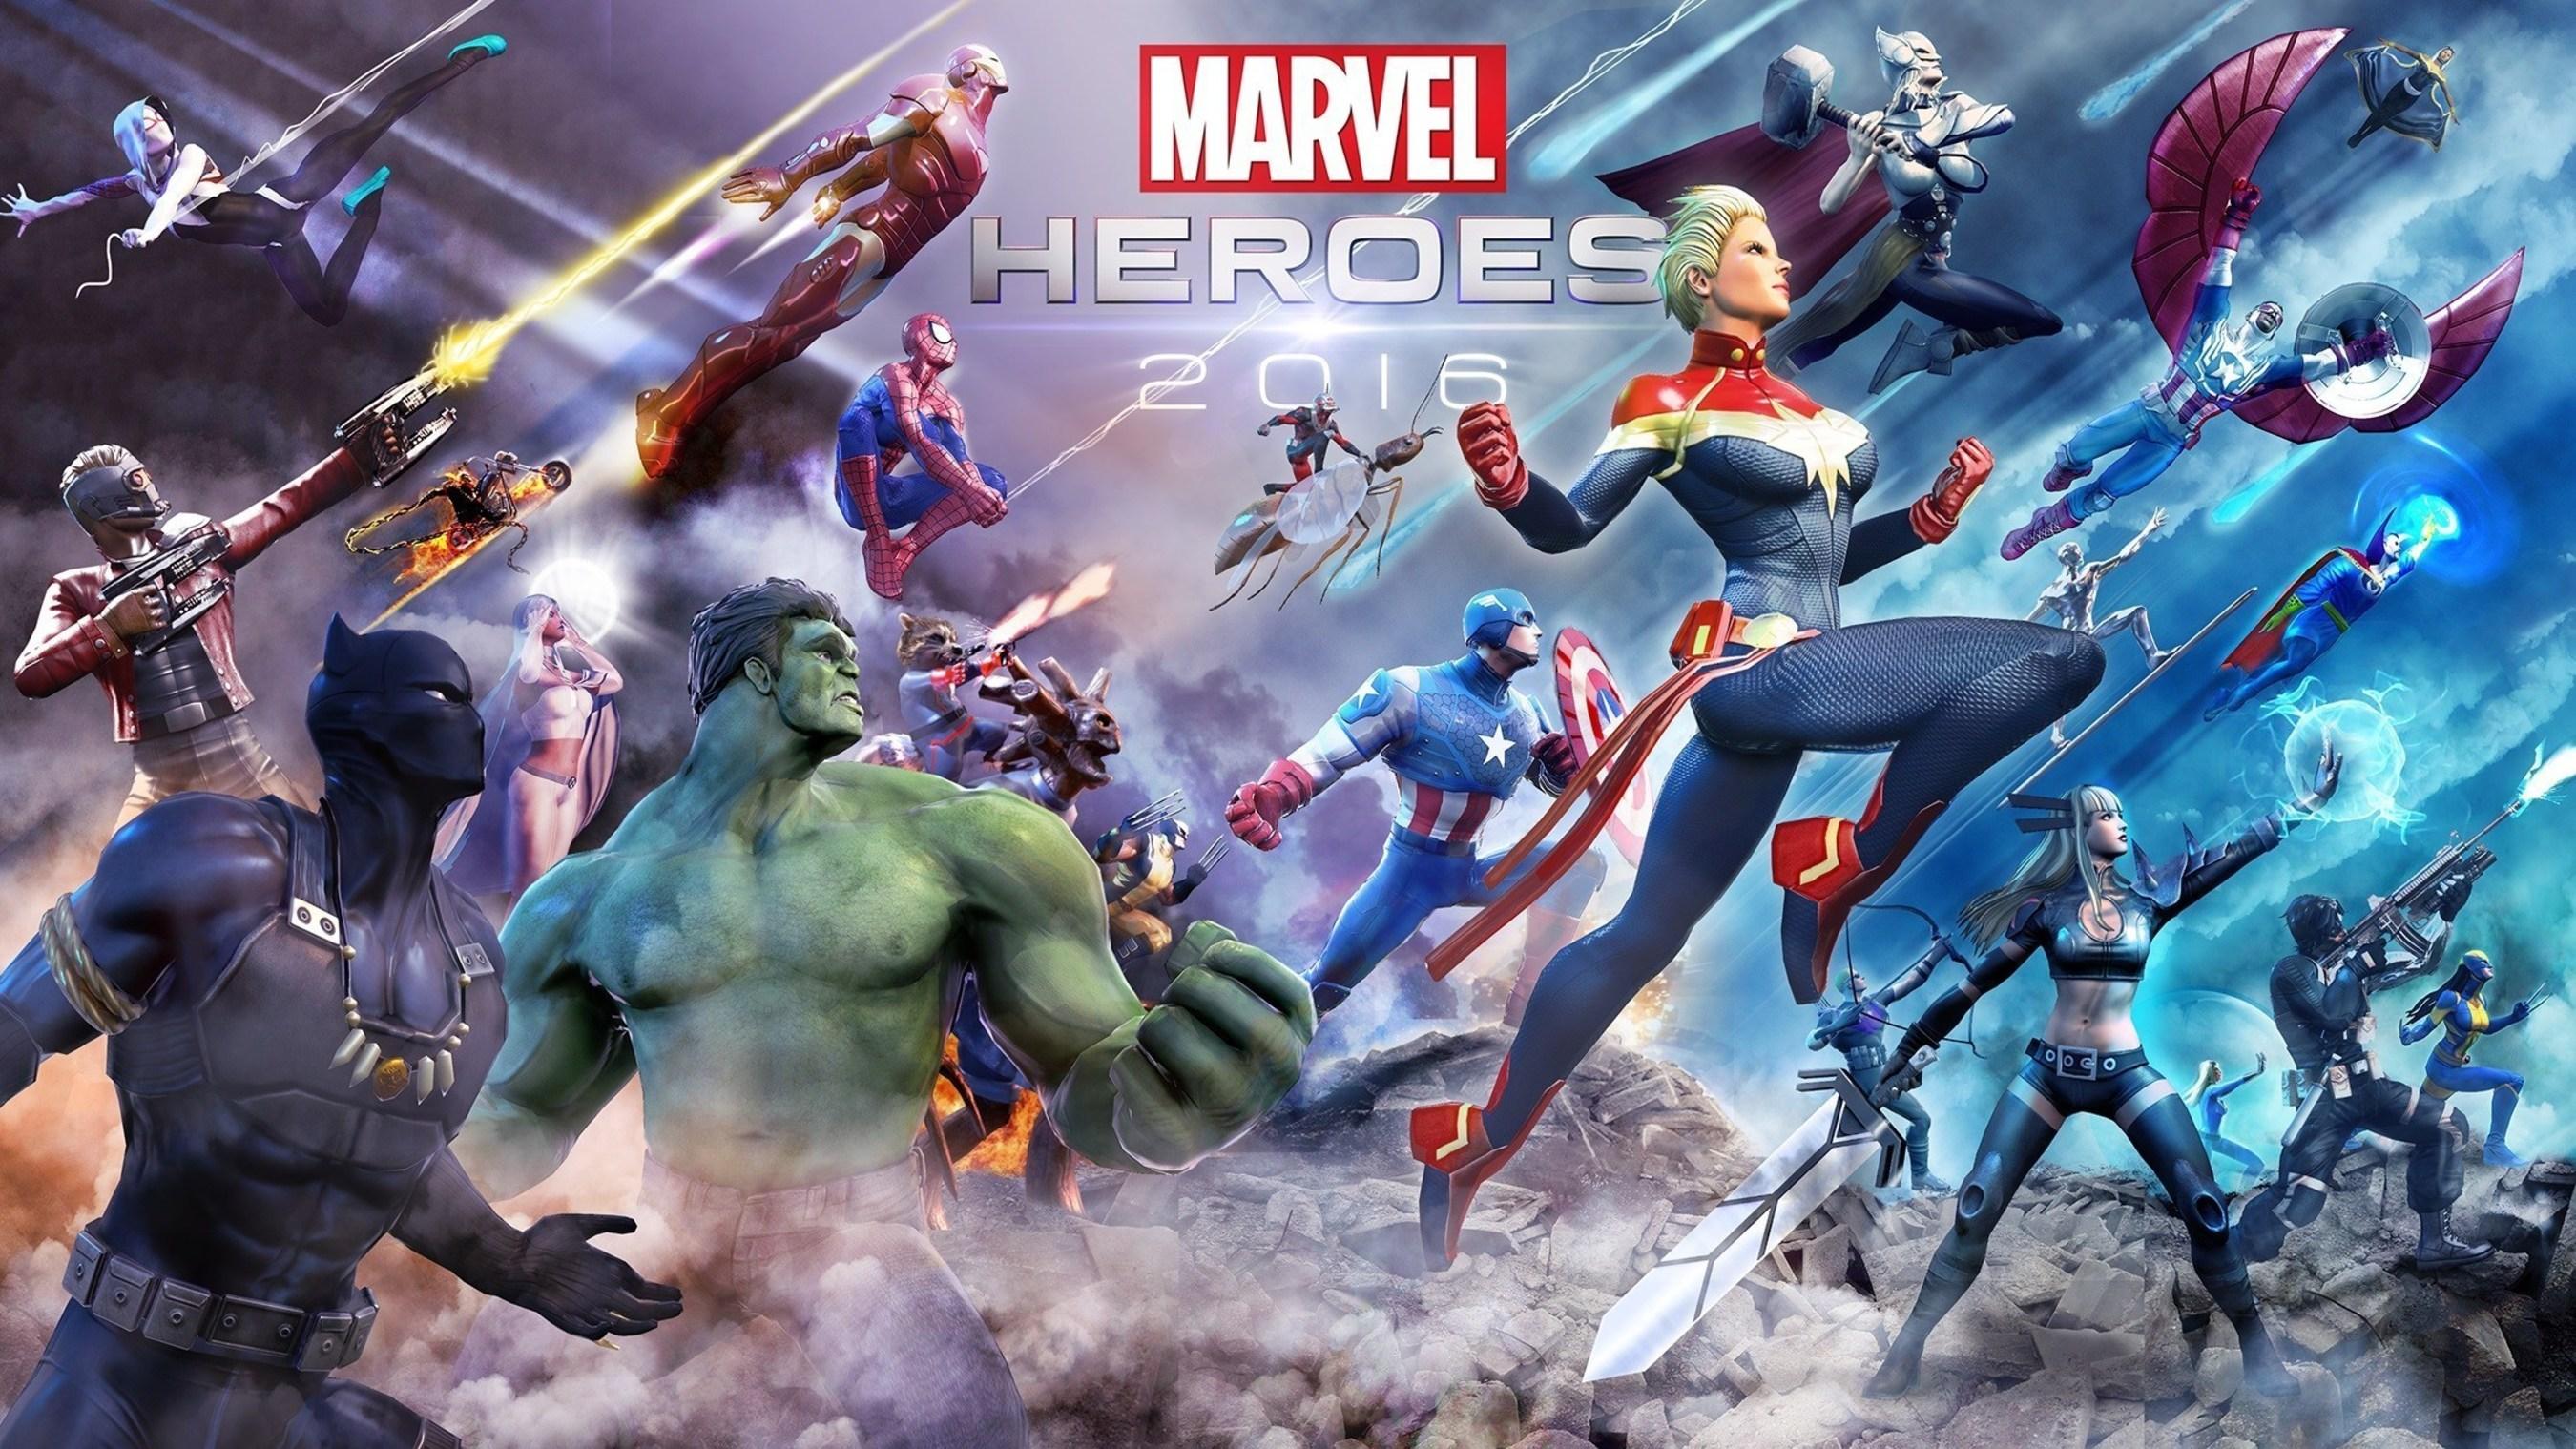 Gazillion's 'Marvel Heroes 2016' Initiative Begins Today